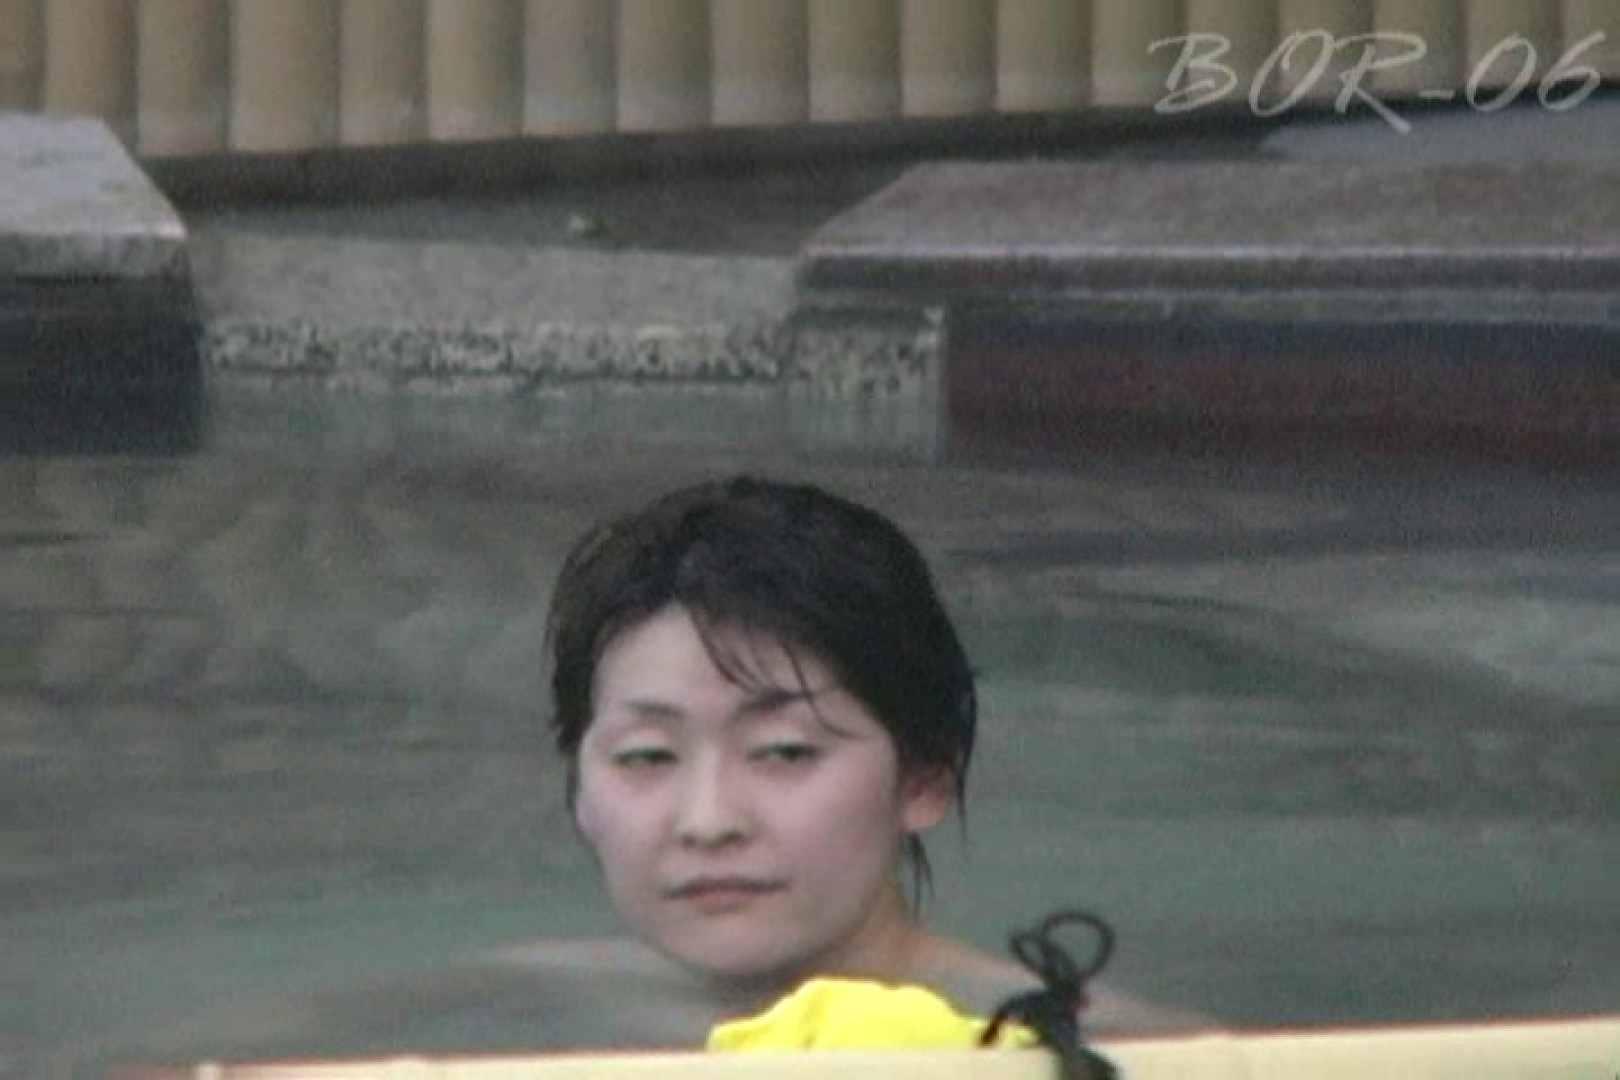 Aquaな露天風呂Vol.523 盗撮 ワレメ無修正動画無料 88枚 8